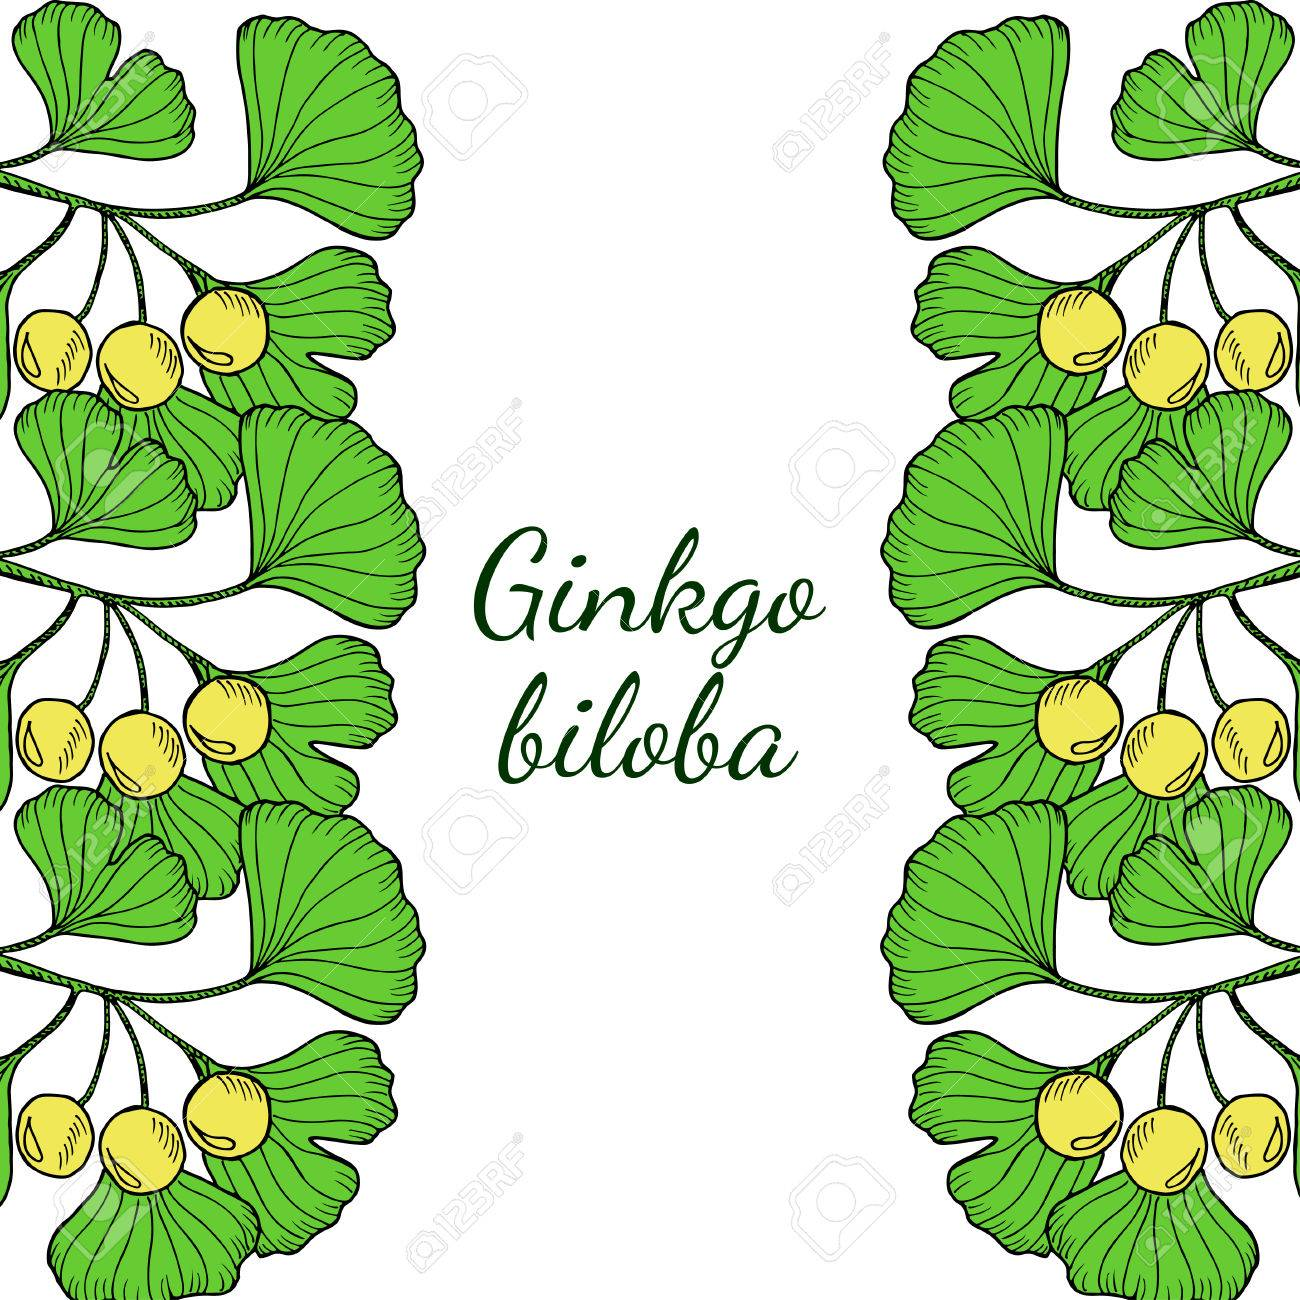 Hand Drawn Medicinal Plant Ginkgo Biloba Tree. Branches Vertical ...